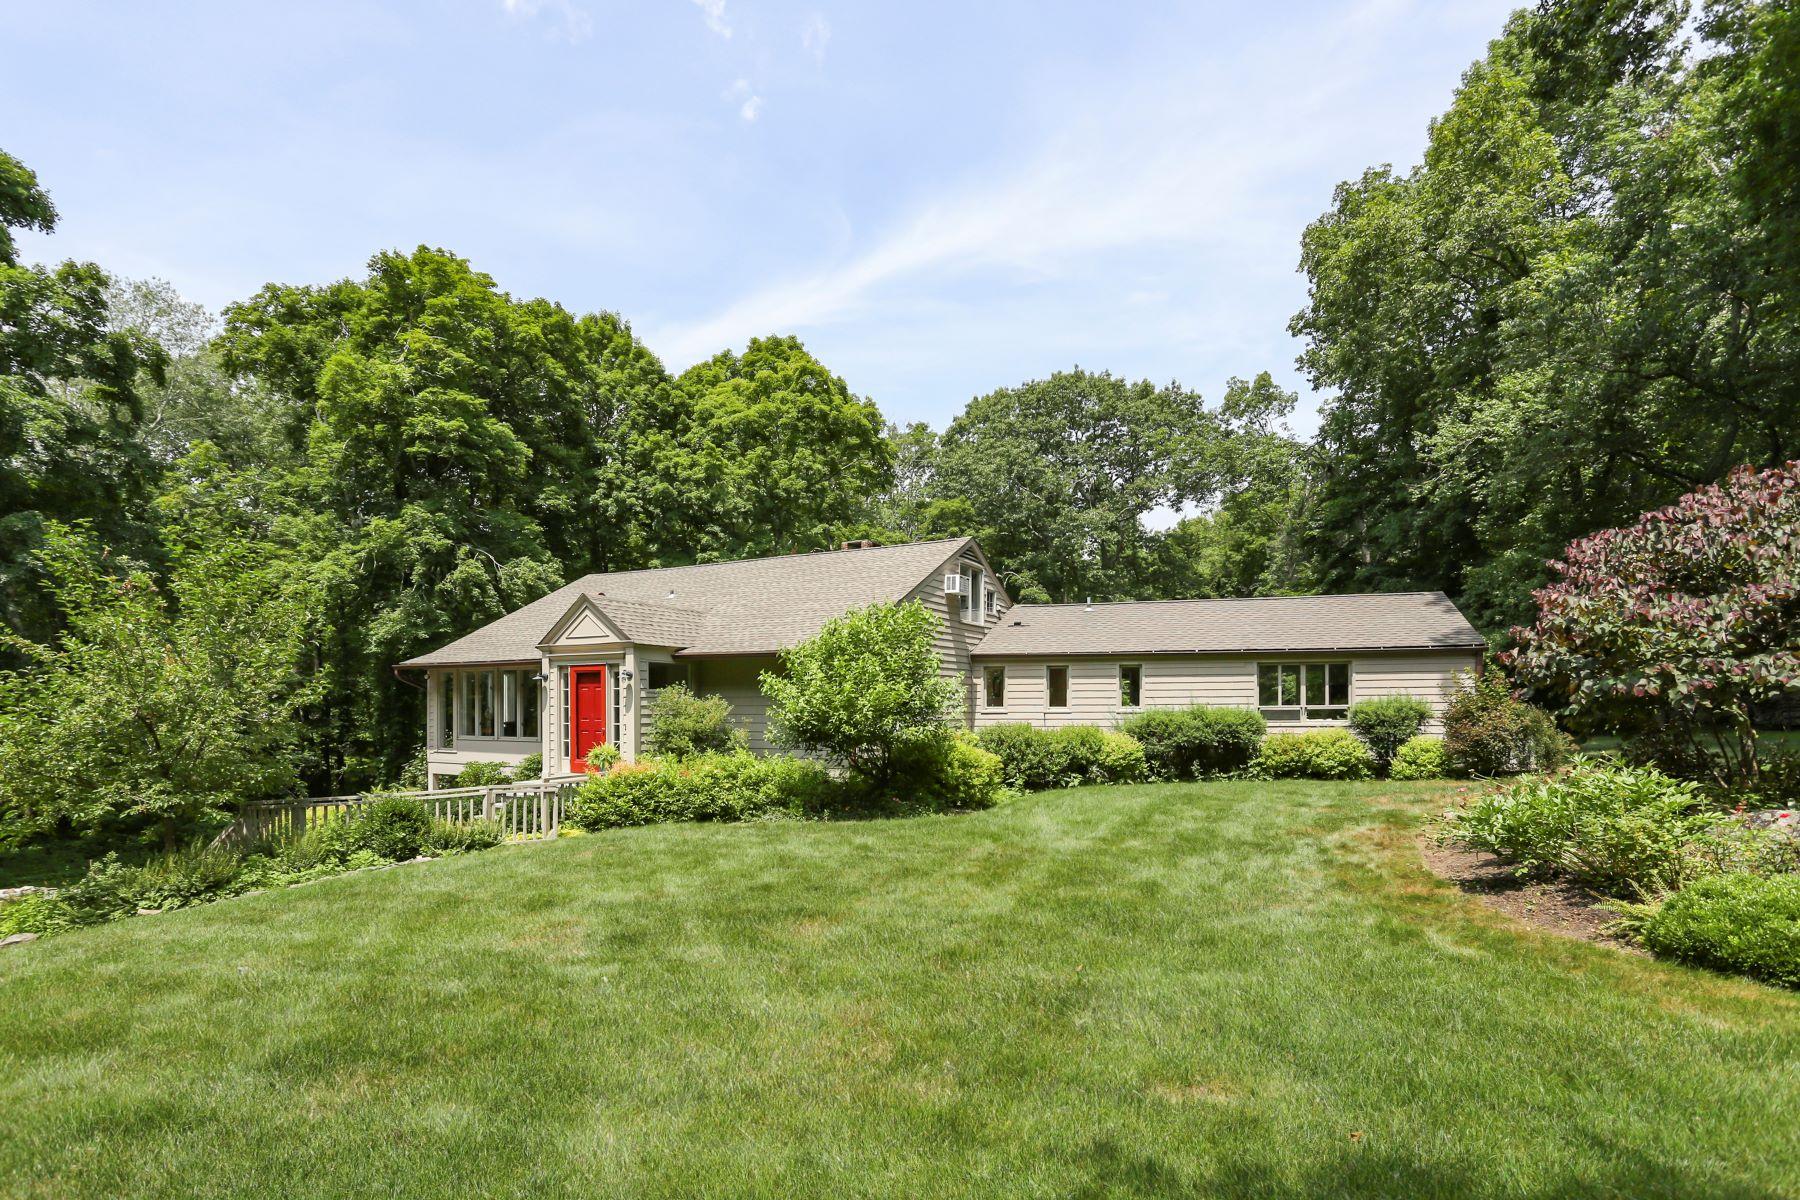 Single Family Homes vì Bán tại Enjoy This Charming Ranch Style Home 86 Godfrey Road West, Weston, Connecticut 06883 Hoa Kỳ